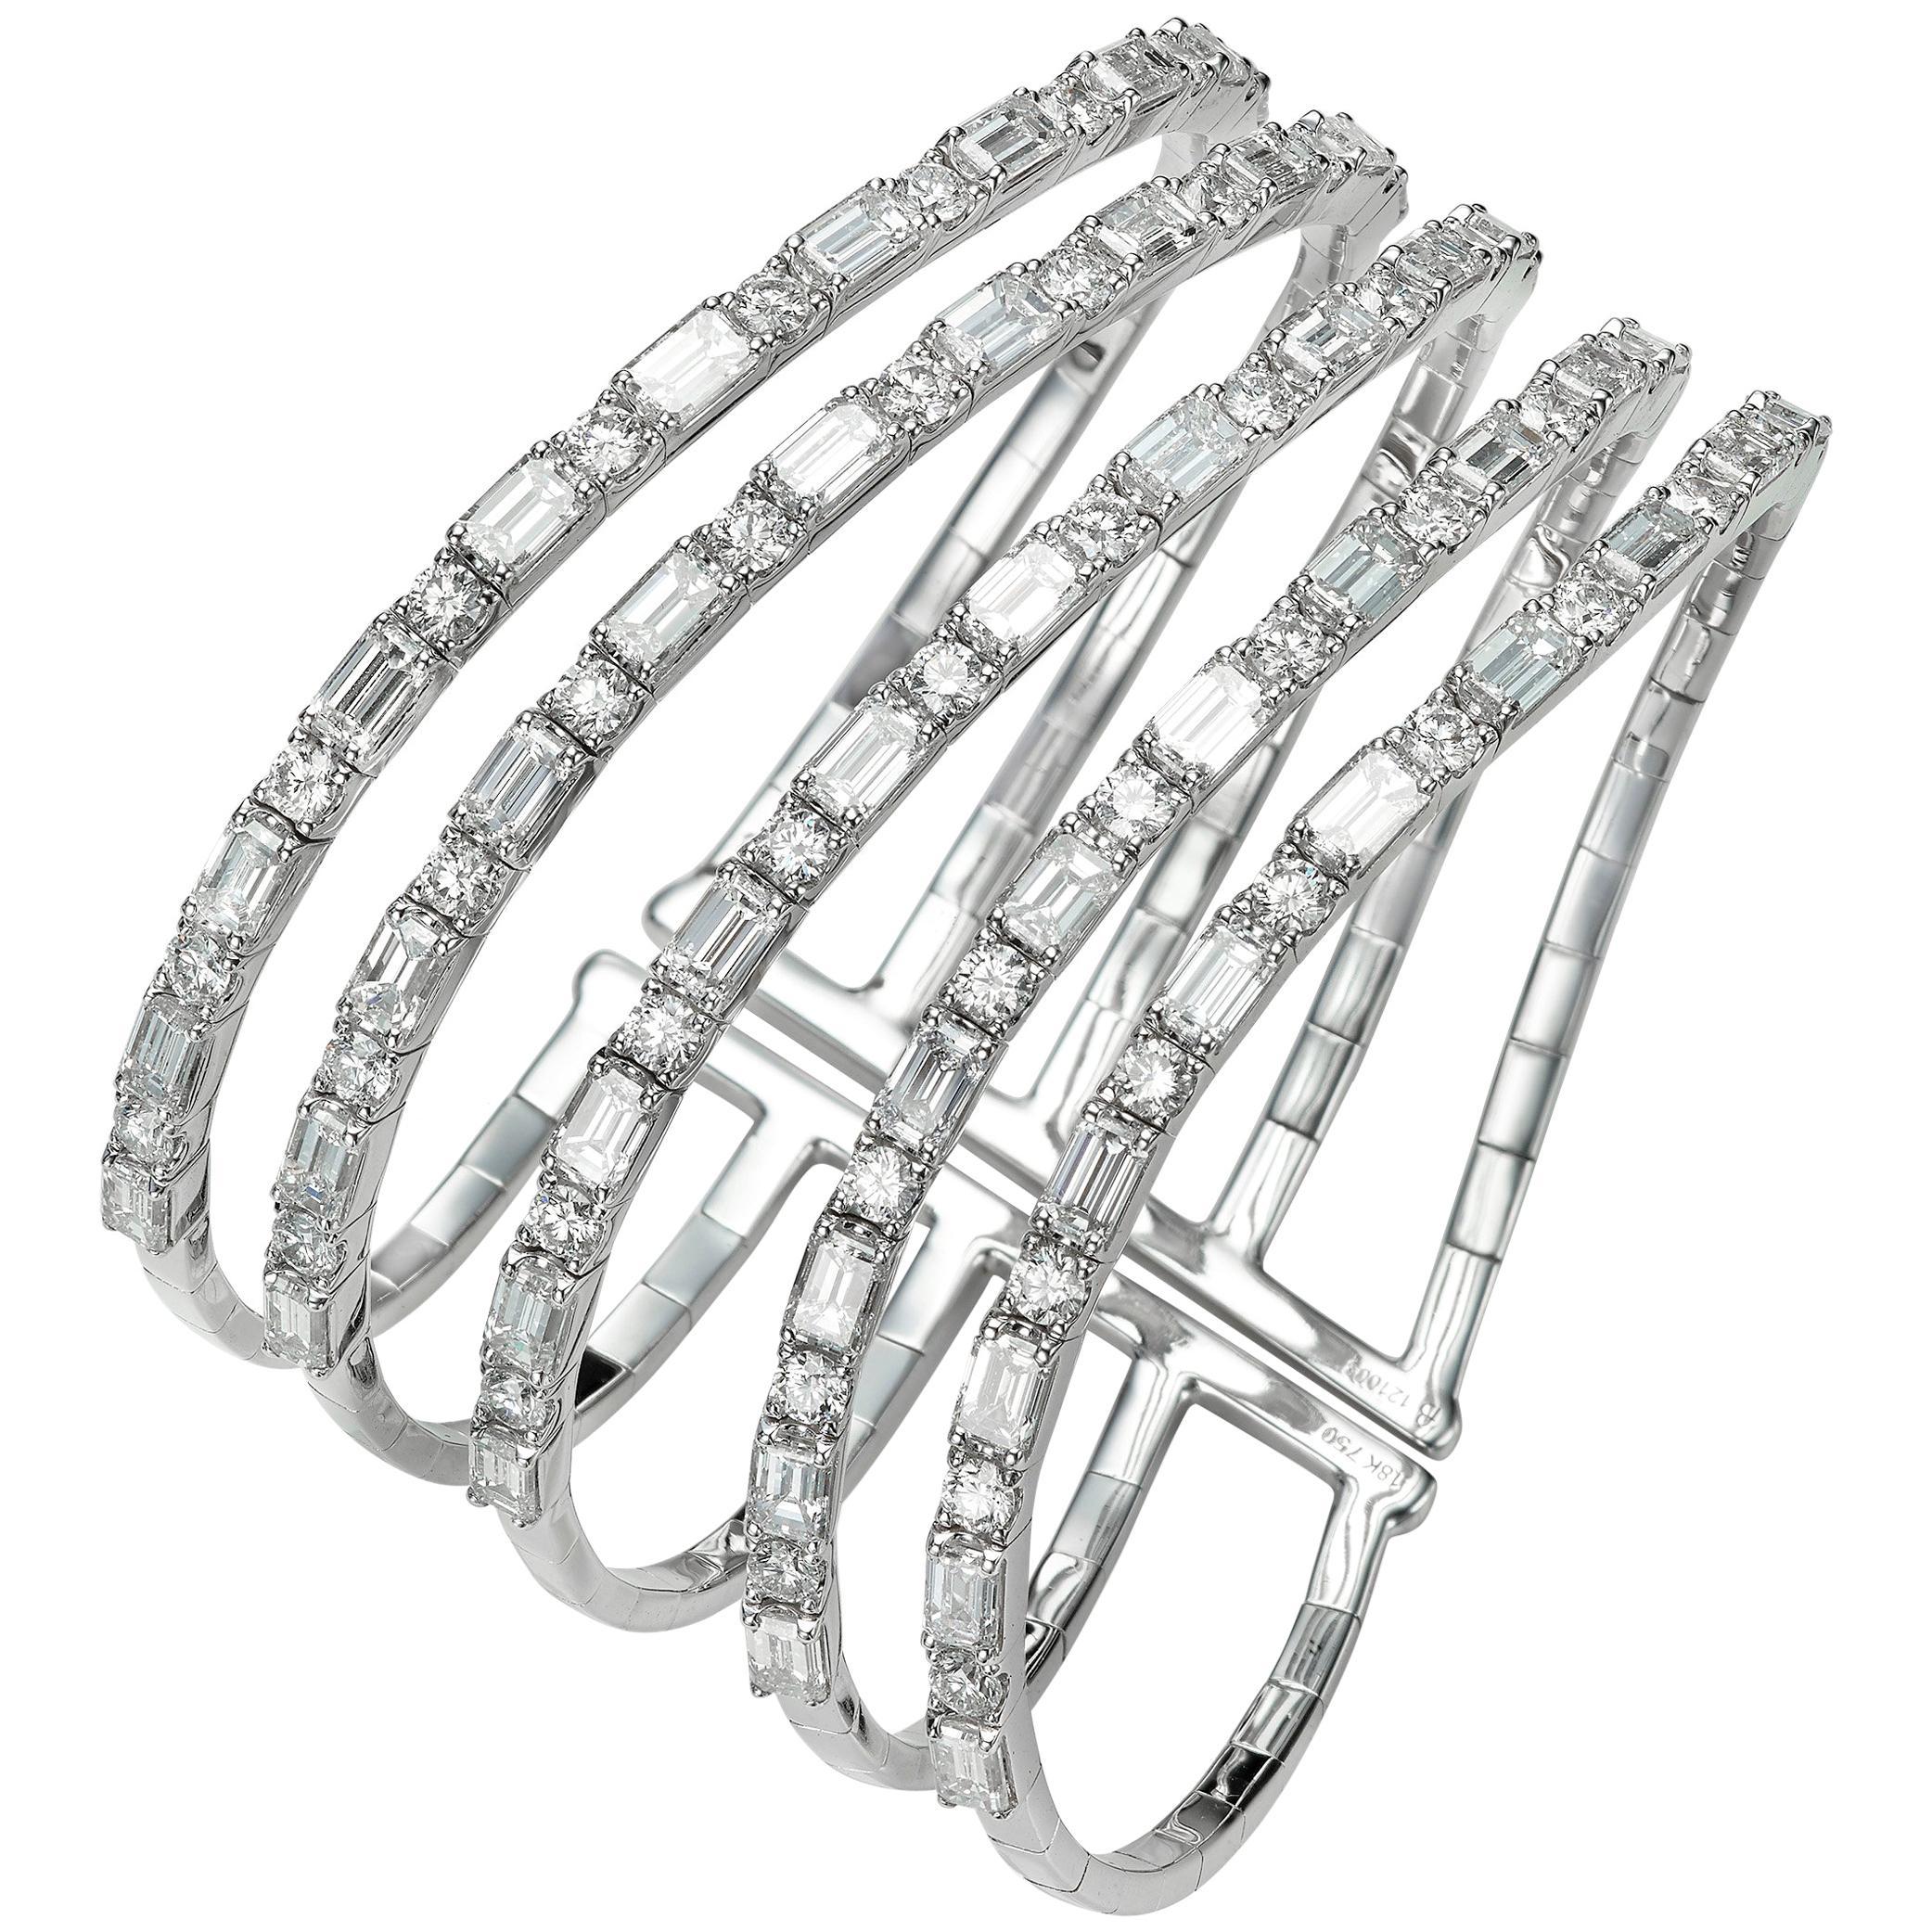 17.66 Carat Five-Row Diamond 18 Karat White Gold Cuff Bangle